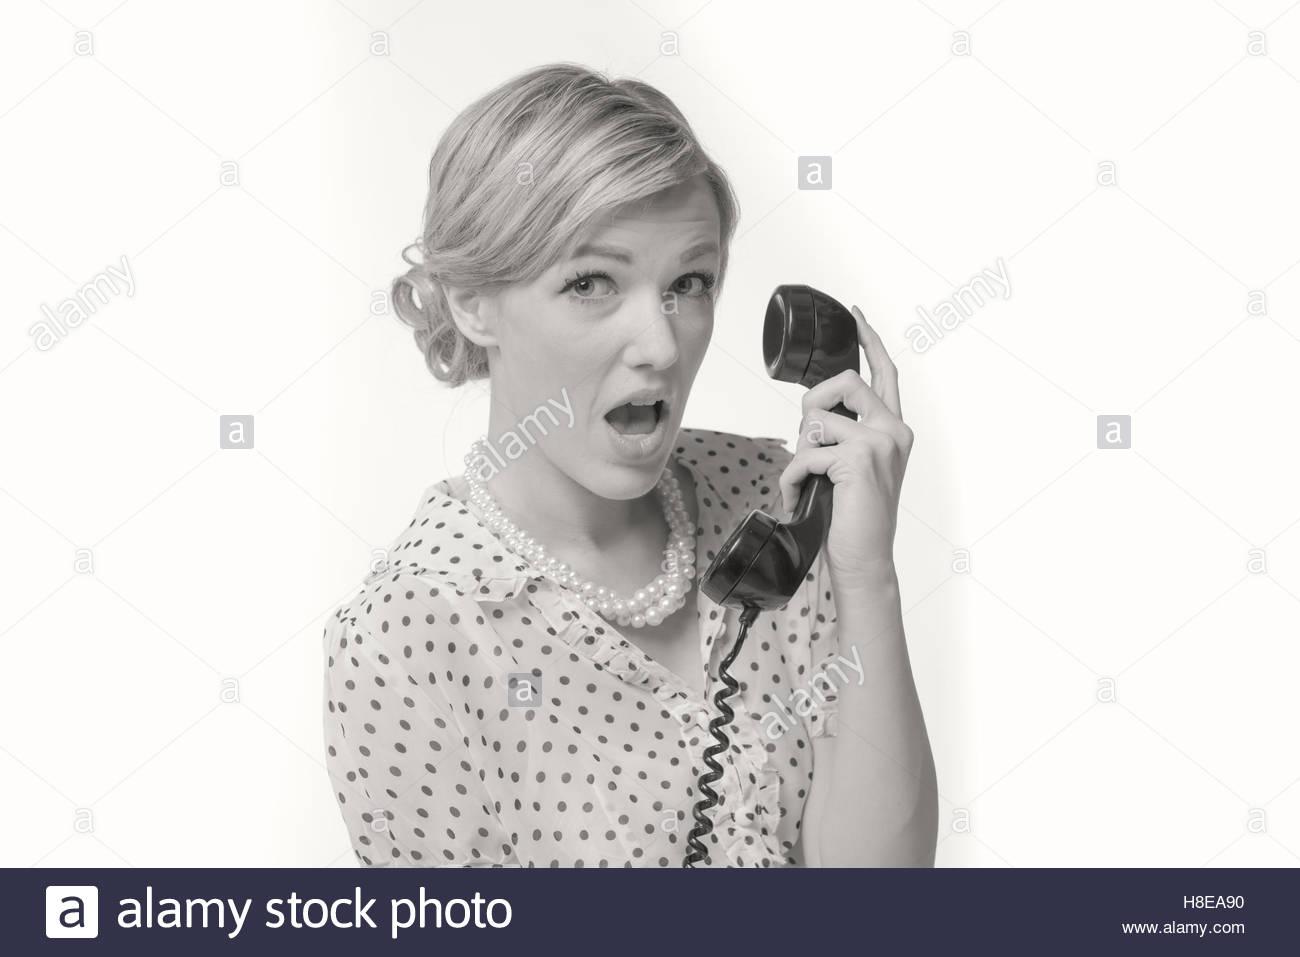 Retro Woman 1950\'s Stockfotos & Retro Woman 1950\'s Bilder - Alamy